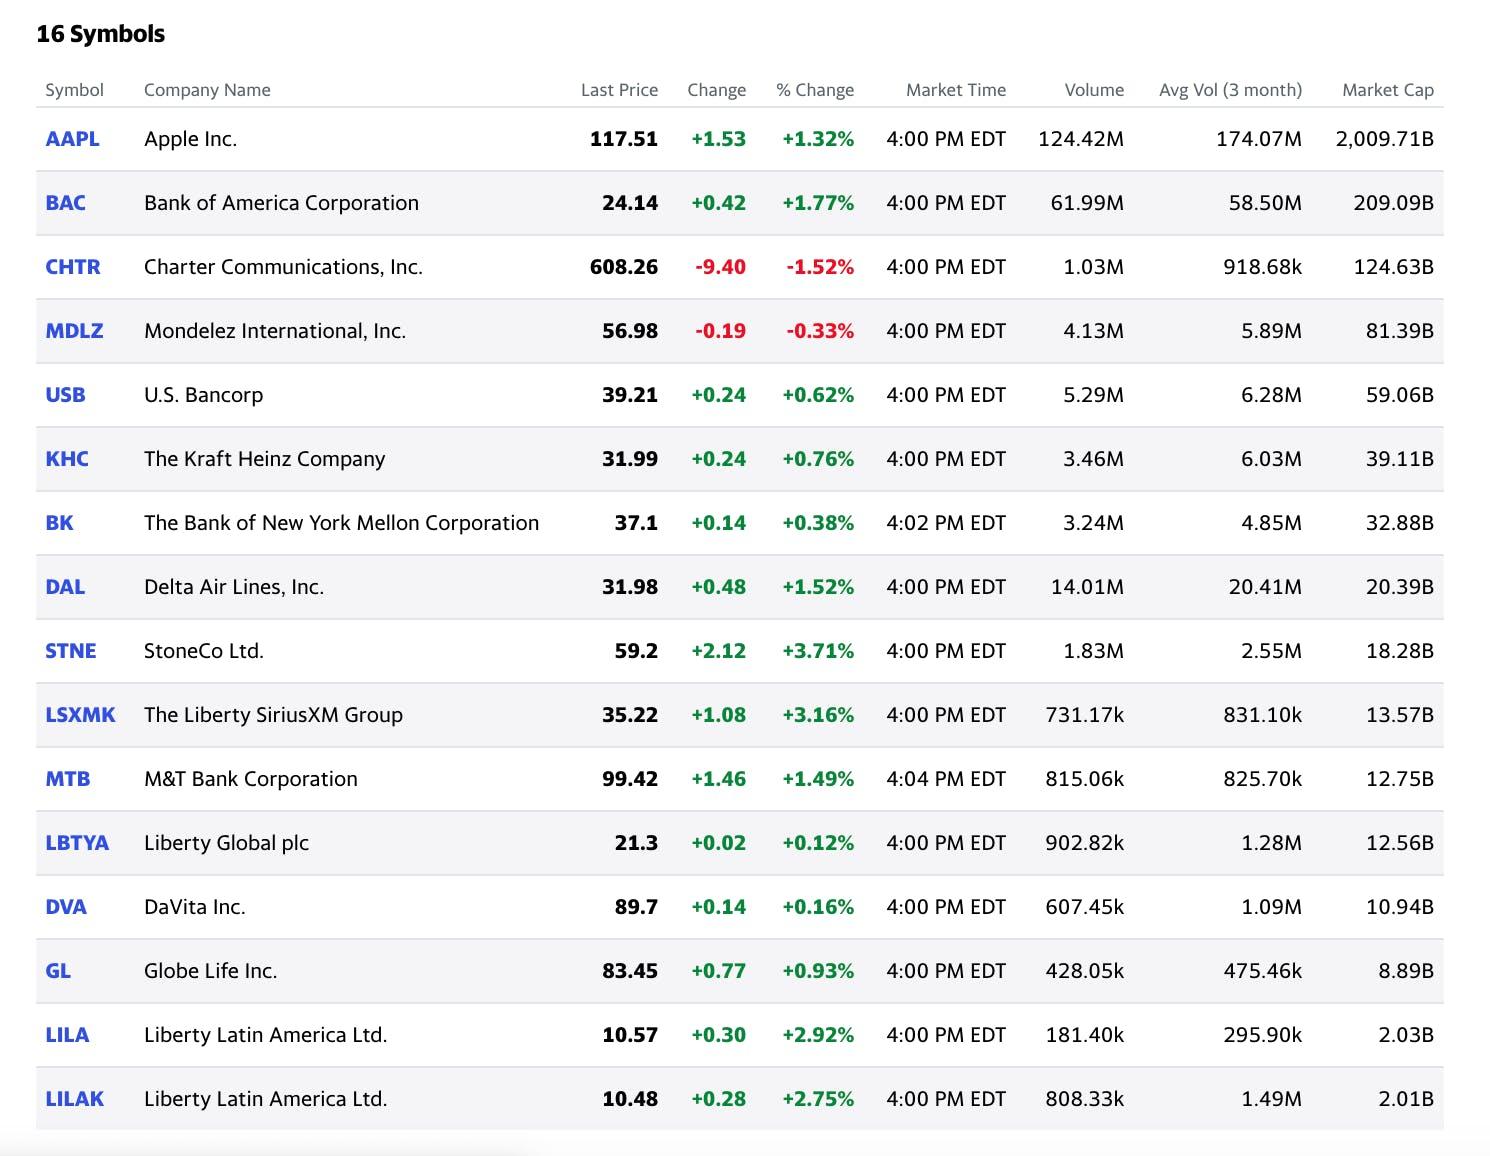 Berkshire Hathaway's portfolio